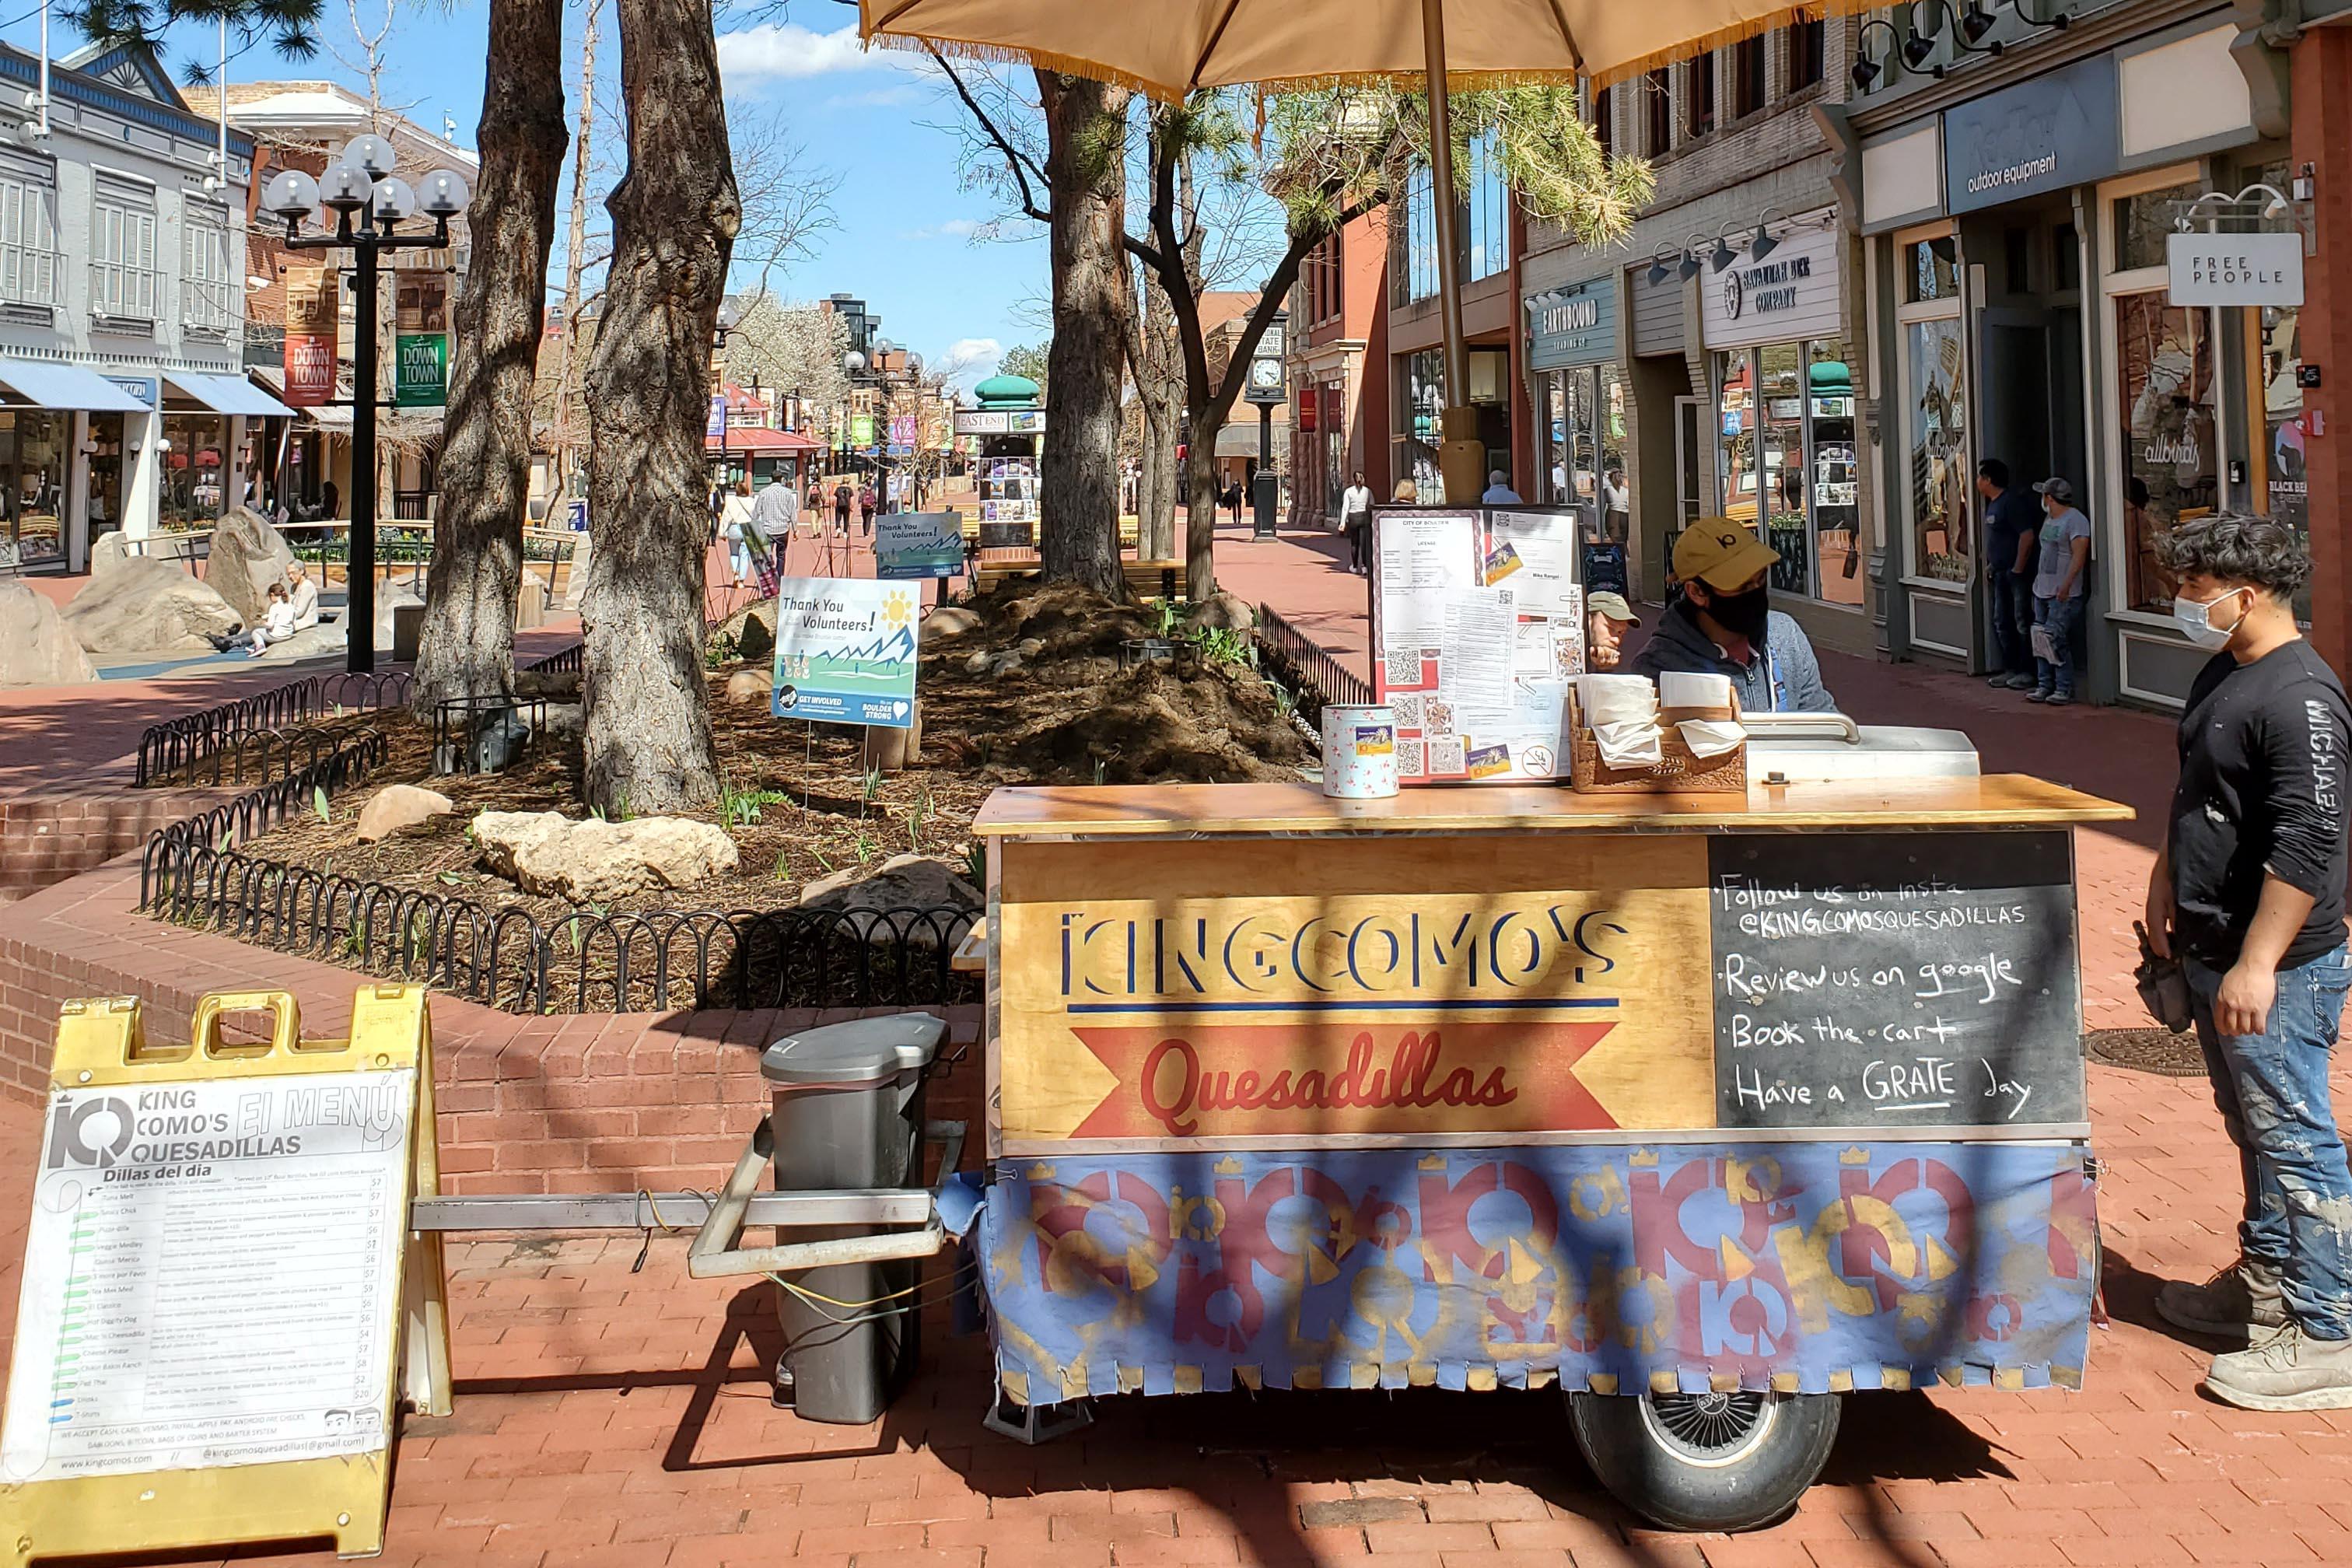 Boulder Lunch Under $10